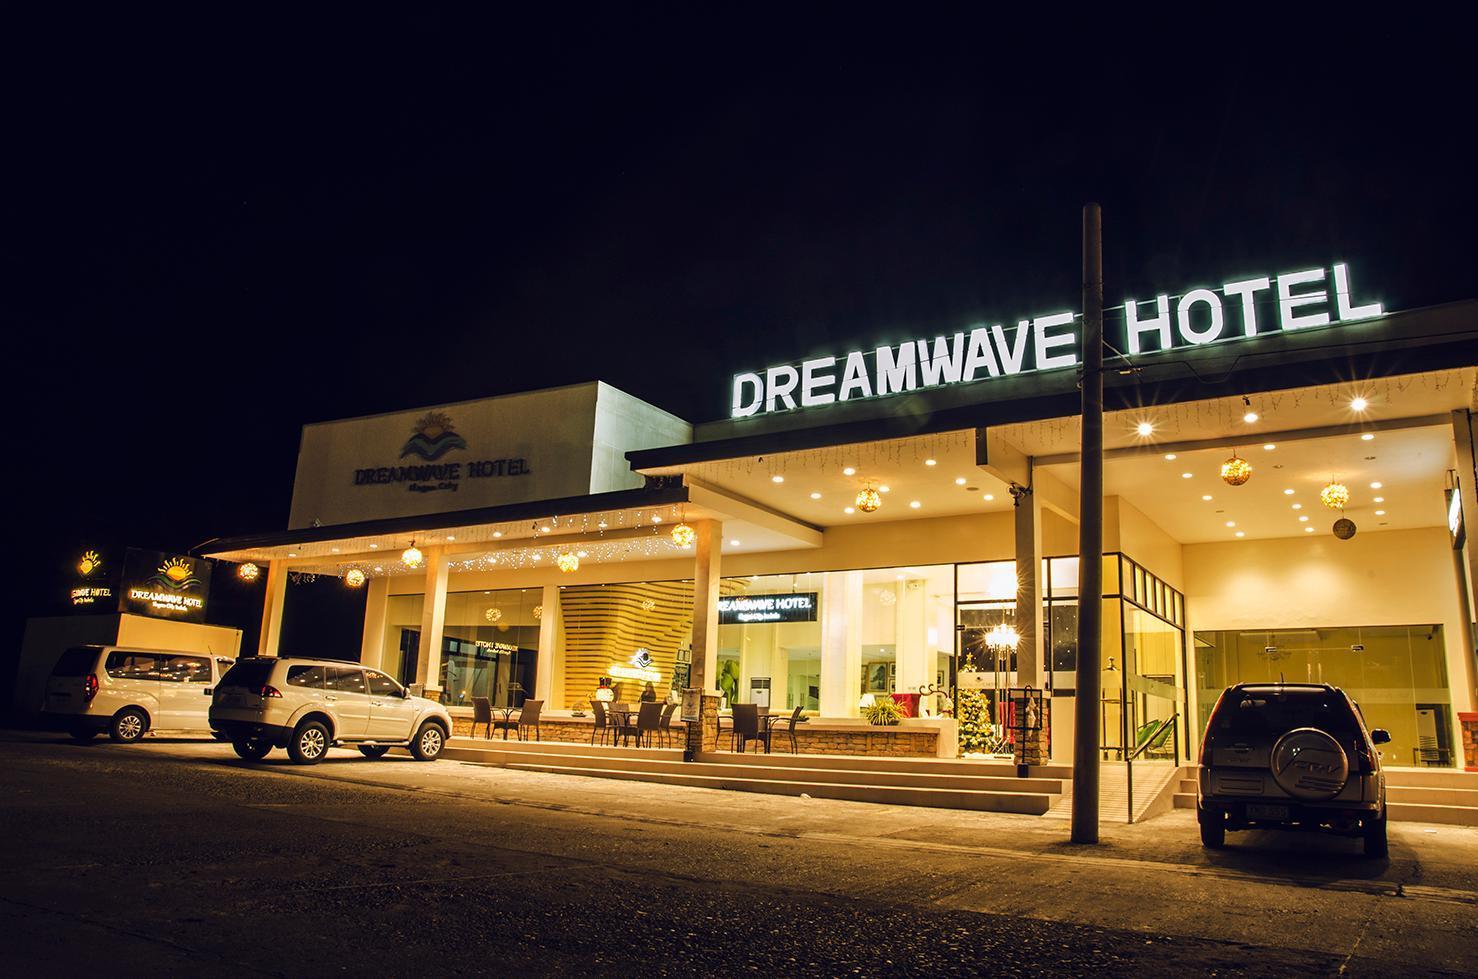 Dreamwave Hotel Ilagan